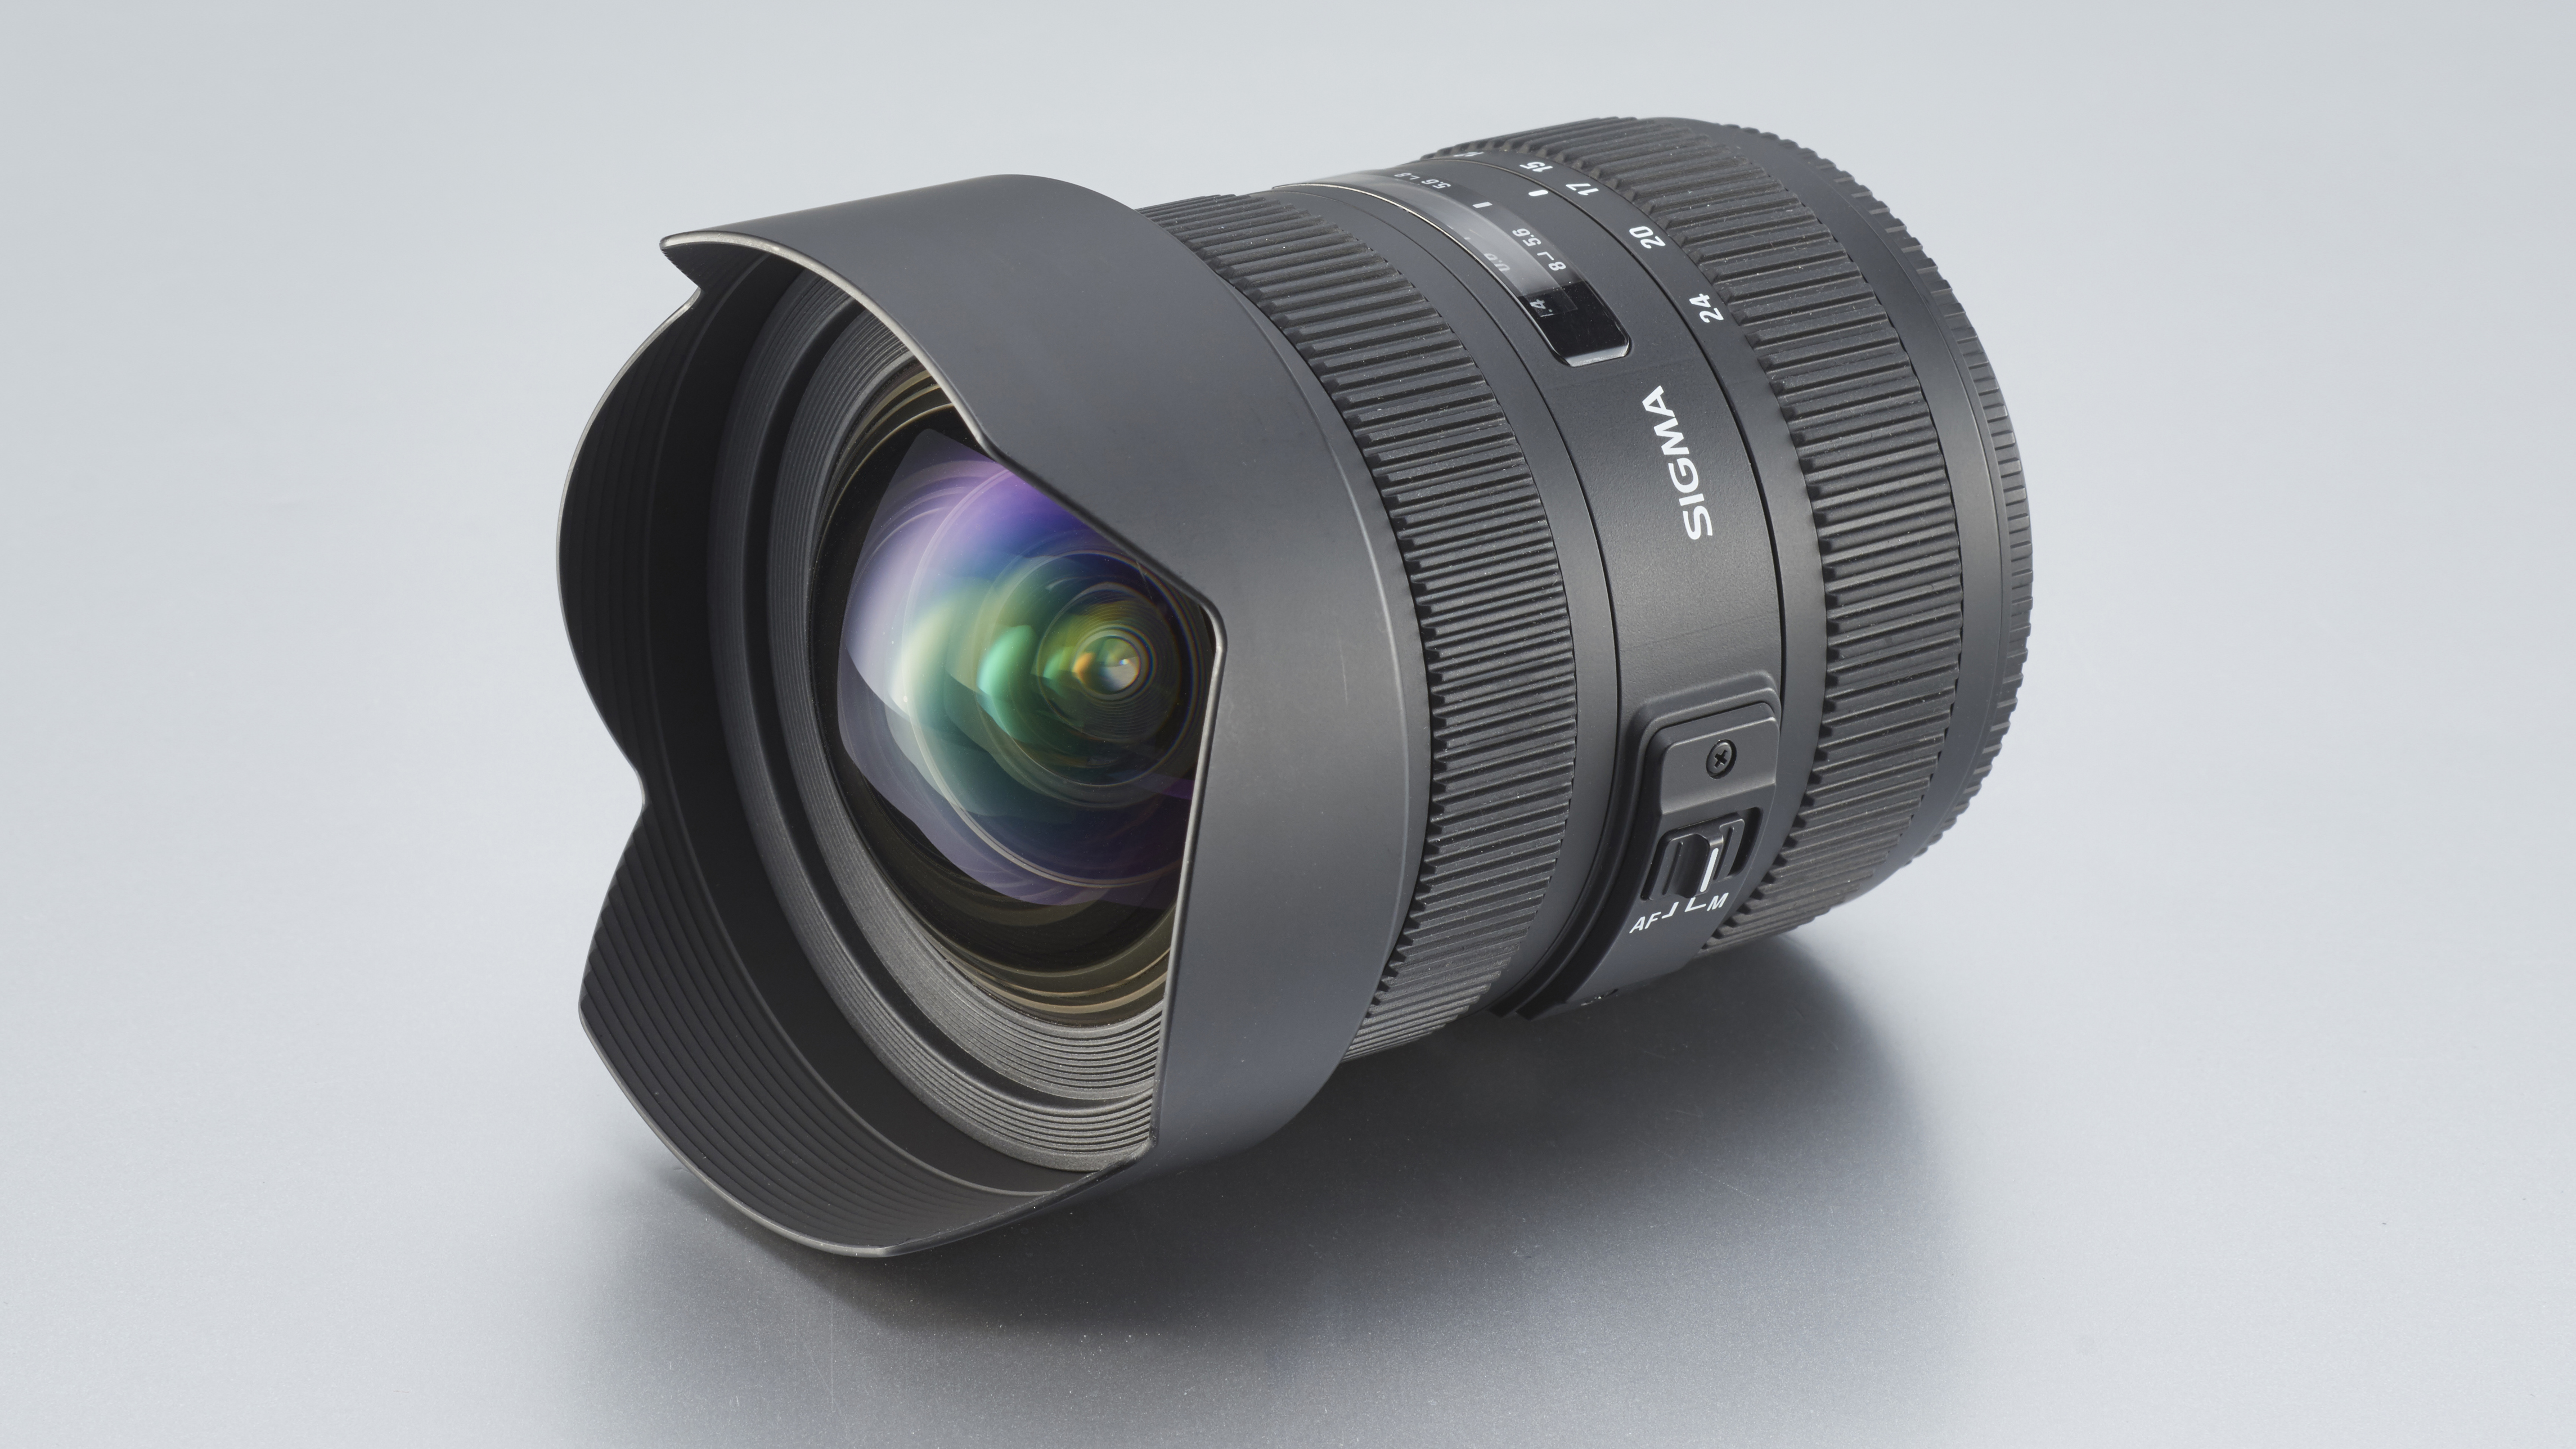 Tamron 15-30mm f/2.8 DI VC USD